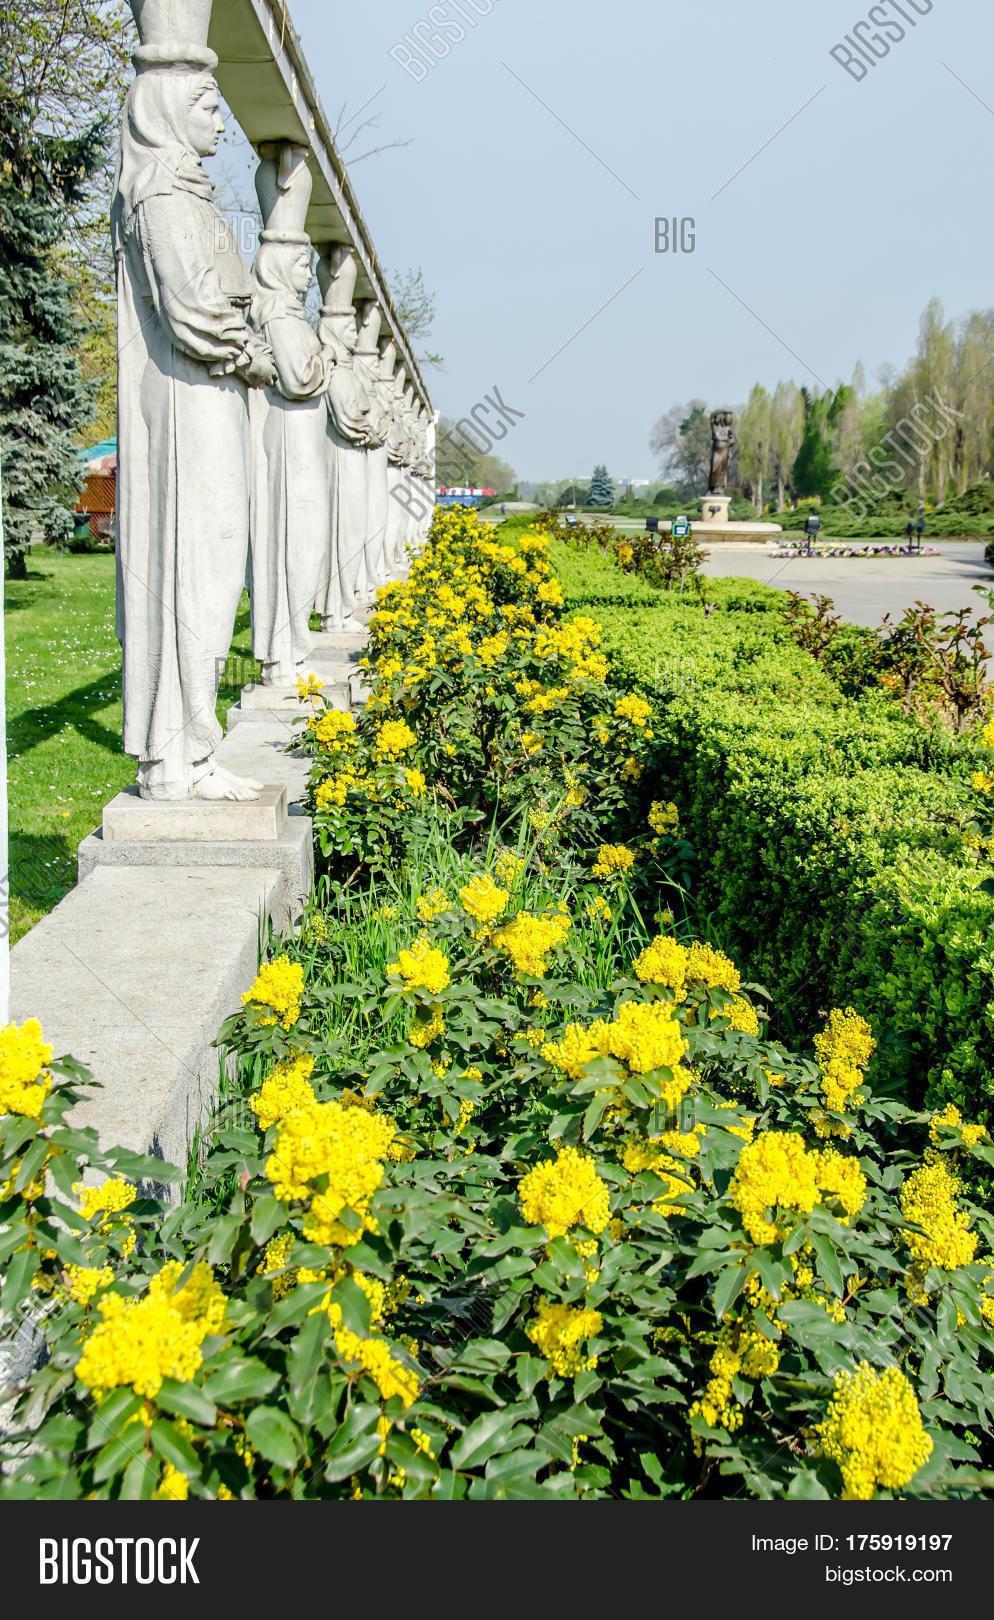 Yellow flowers called image photo free trial bigstock yellow flowers called saint joan flower galium verum mightylinksfo